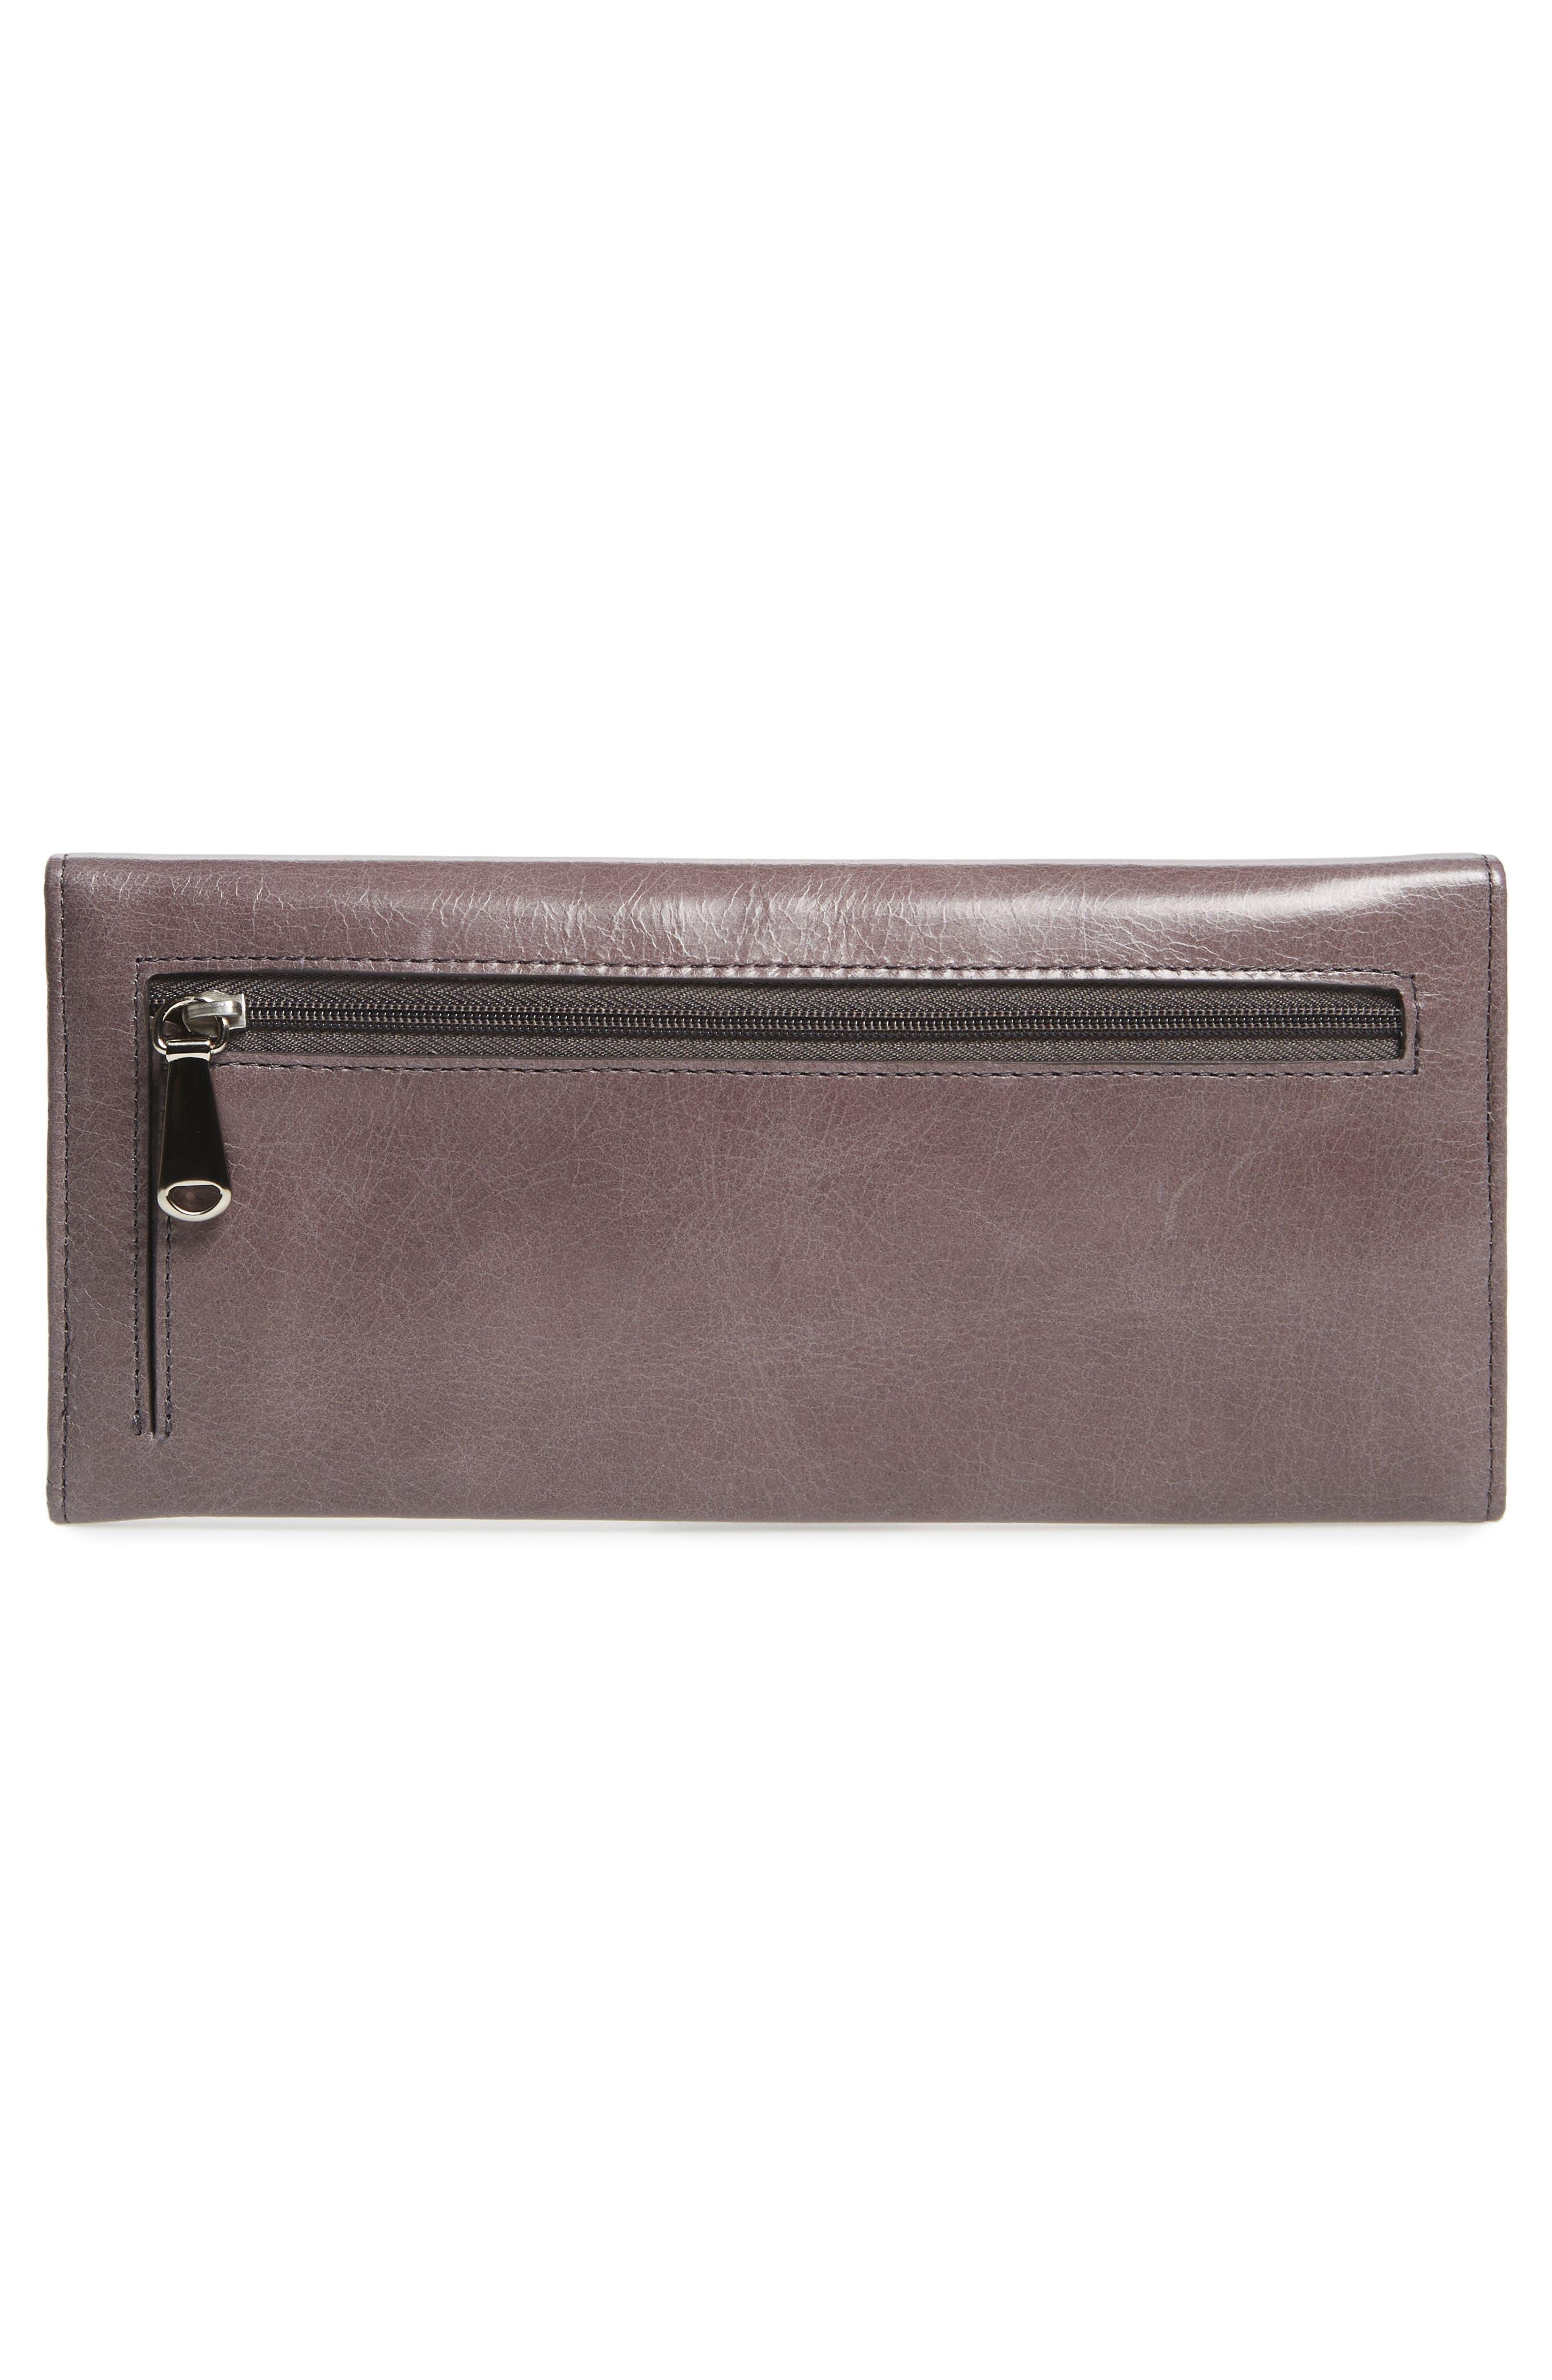 'Sadie' Leather Wallet,                             Alternate thumbnail 114, color,